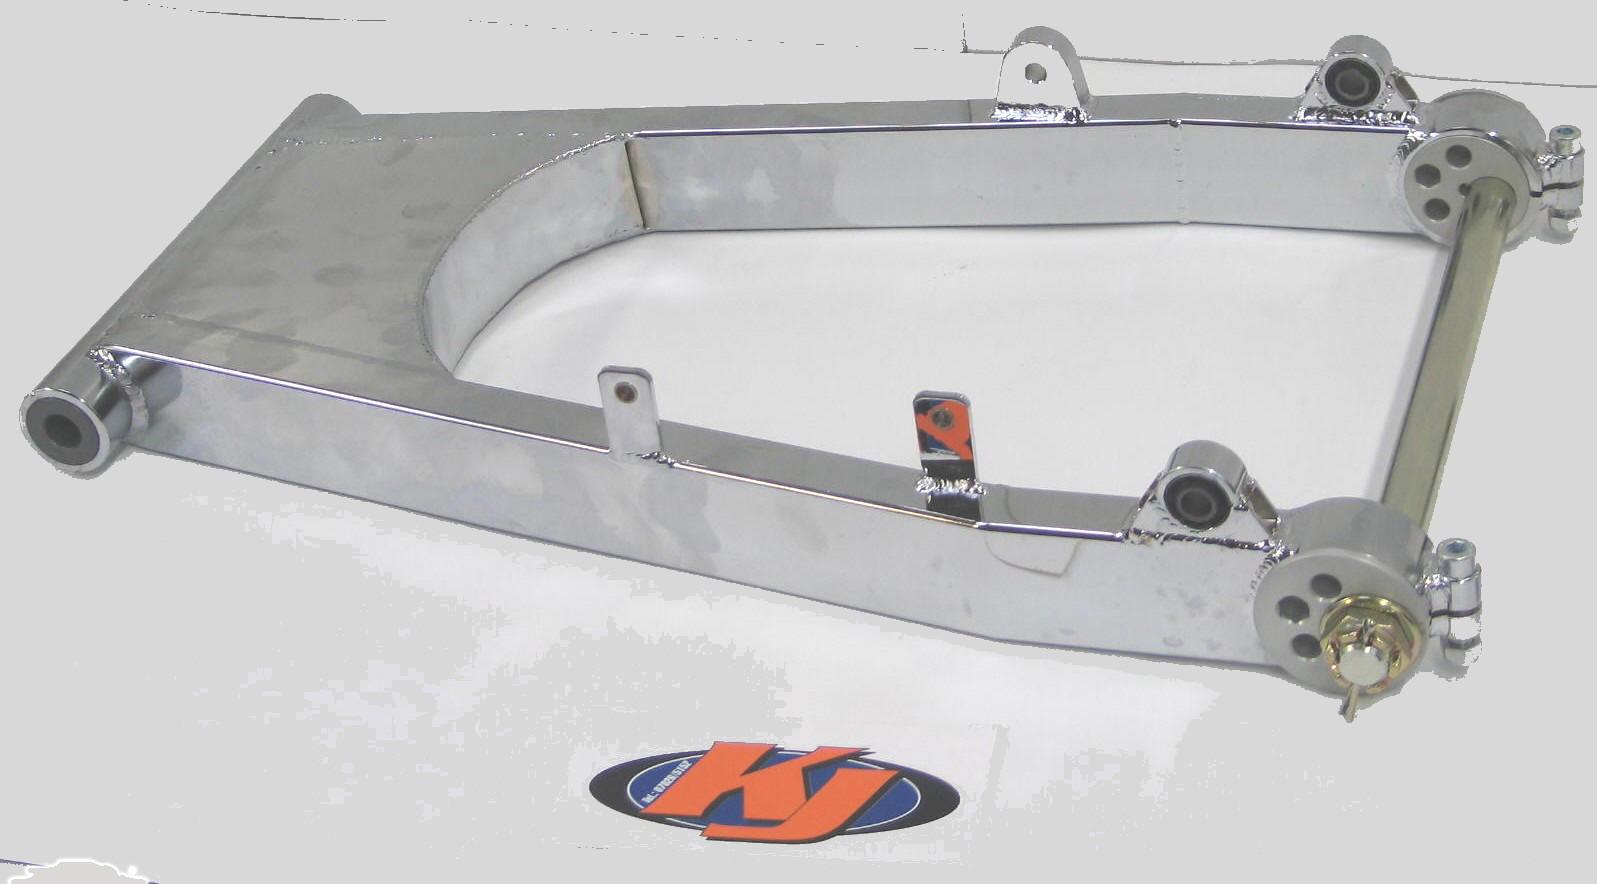 Identification d'un bras oscillant Exzenterschwinge-1006